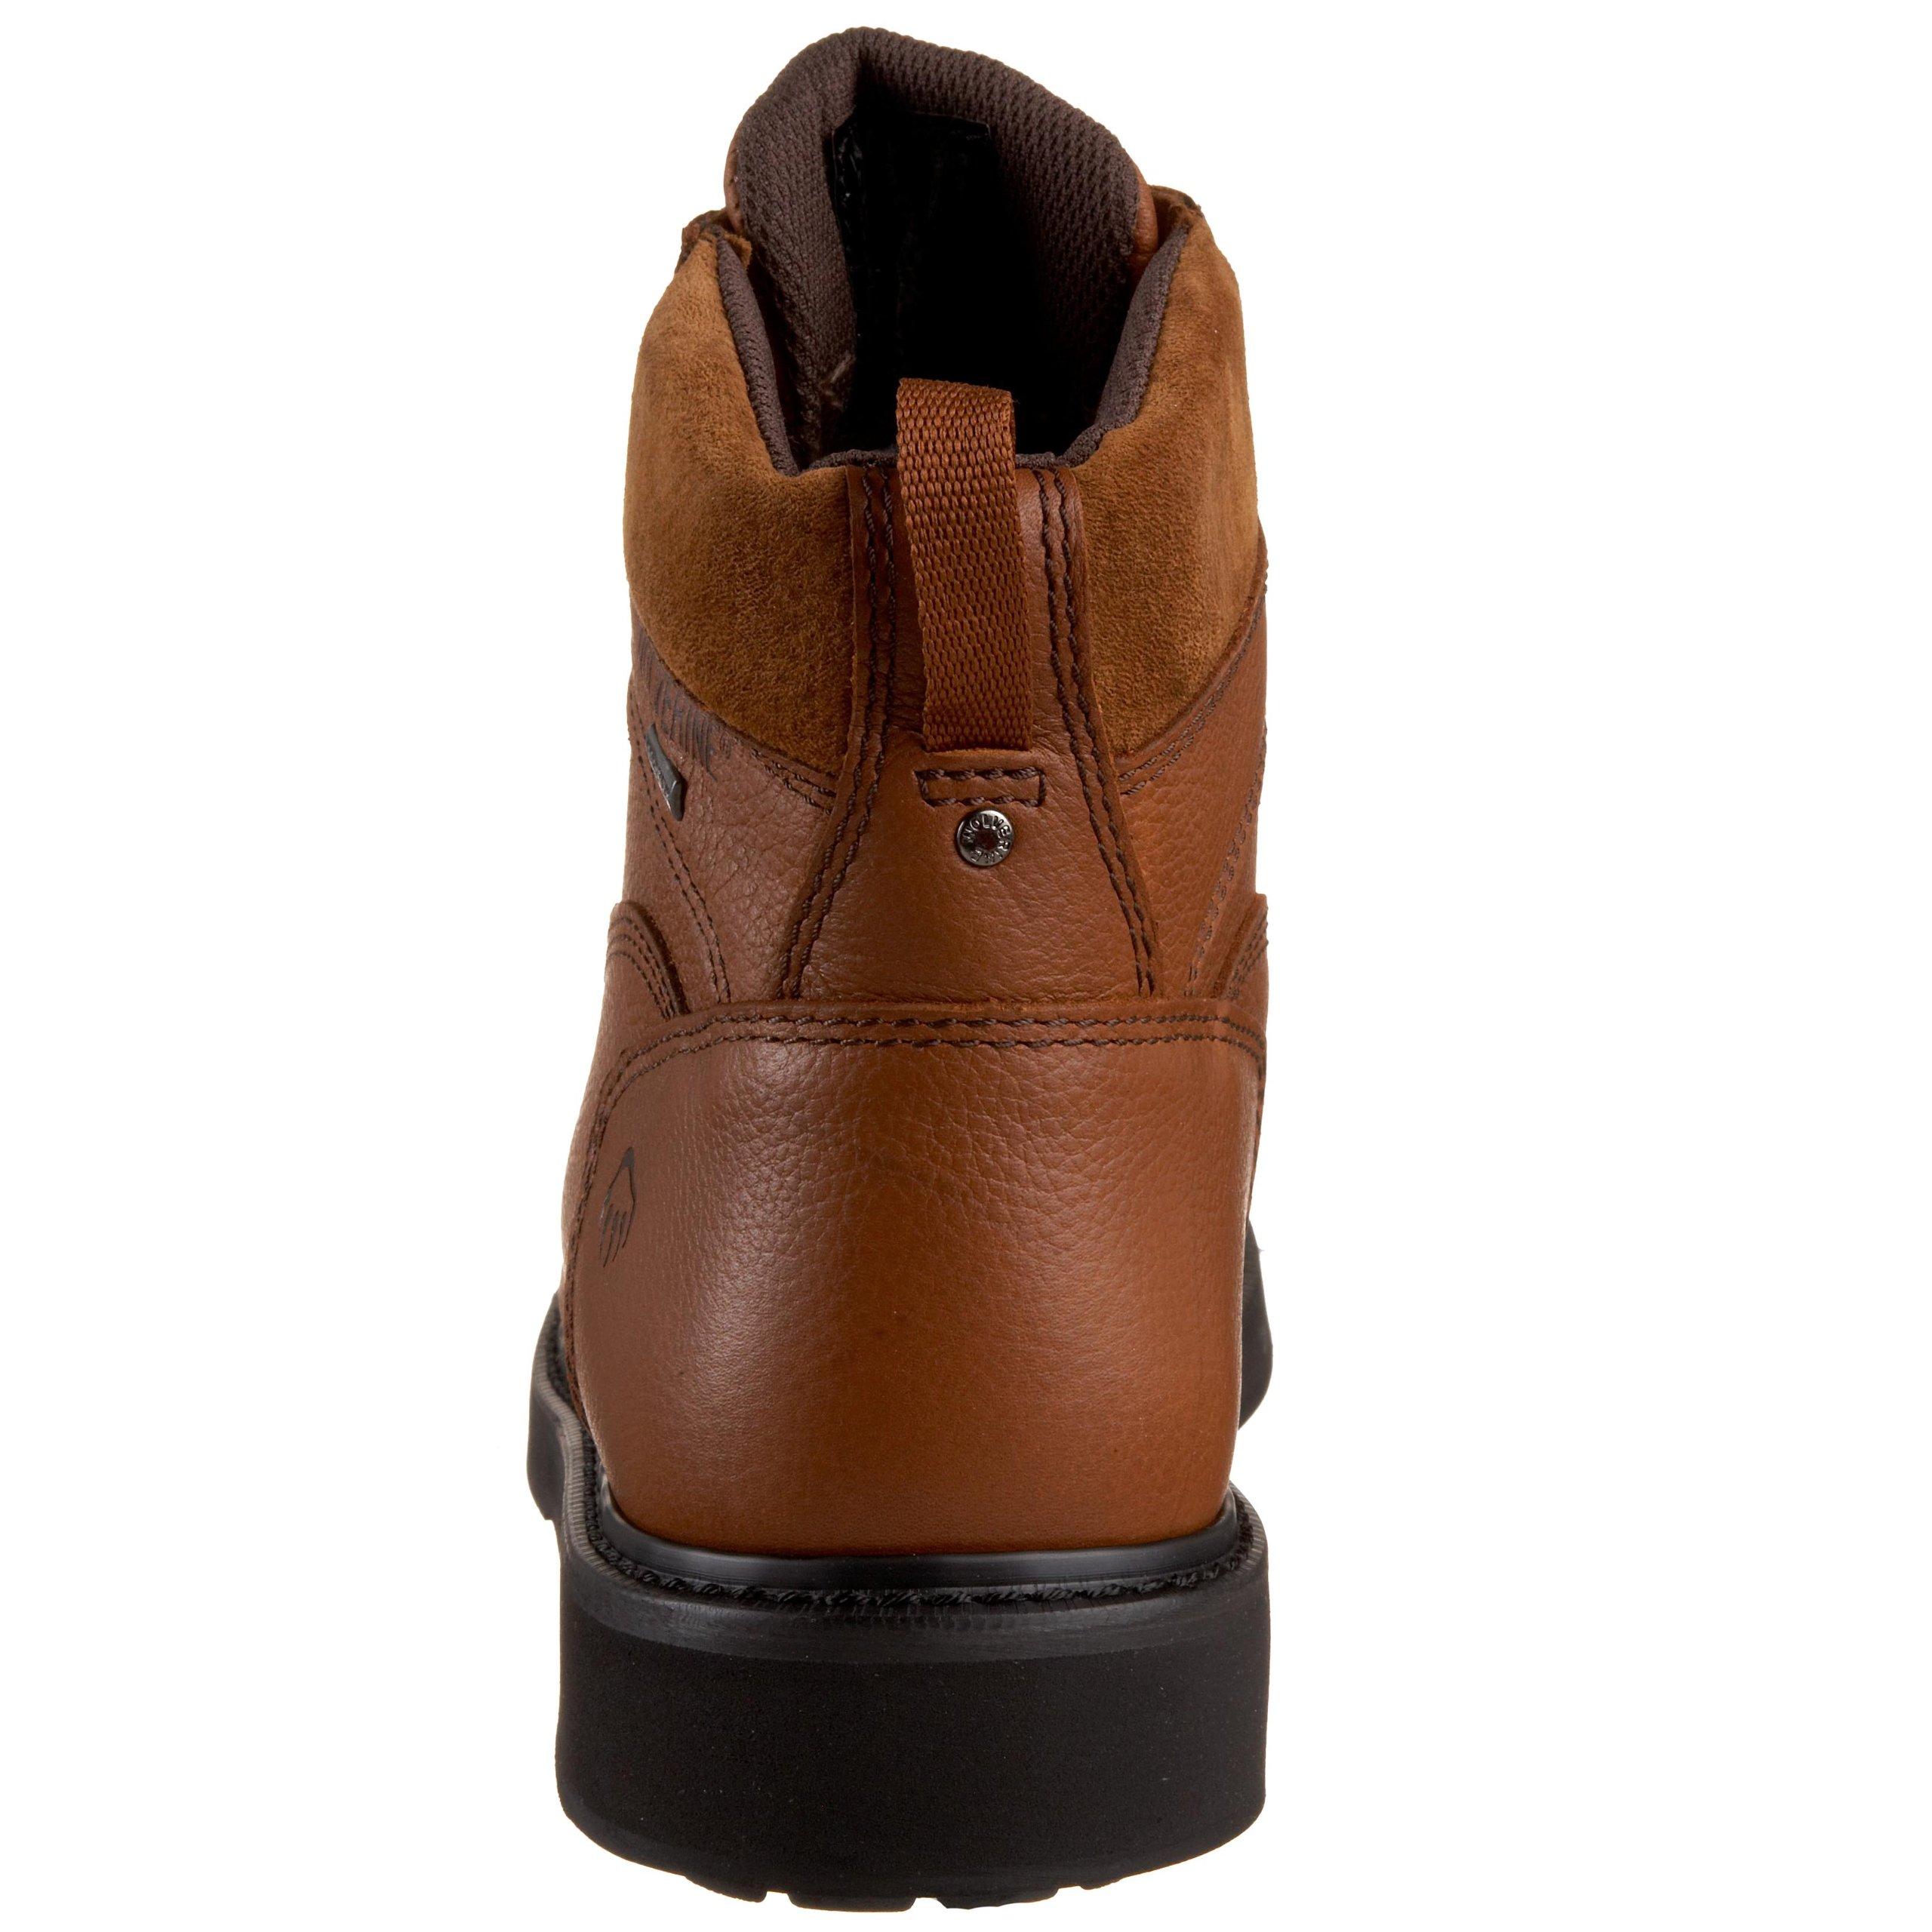 Wolverine Men's W02564 Durashock Boot, Brown, 7 M US by Wolverine (Image #2)